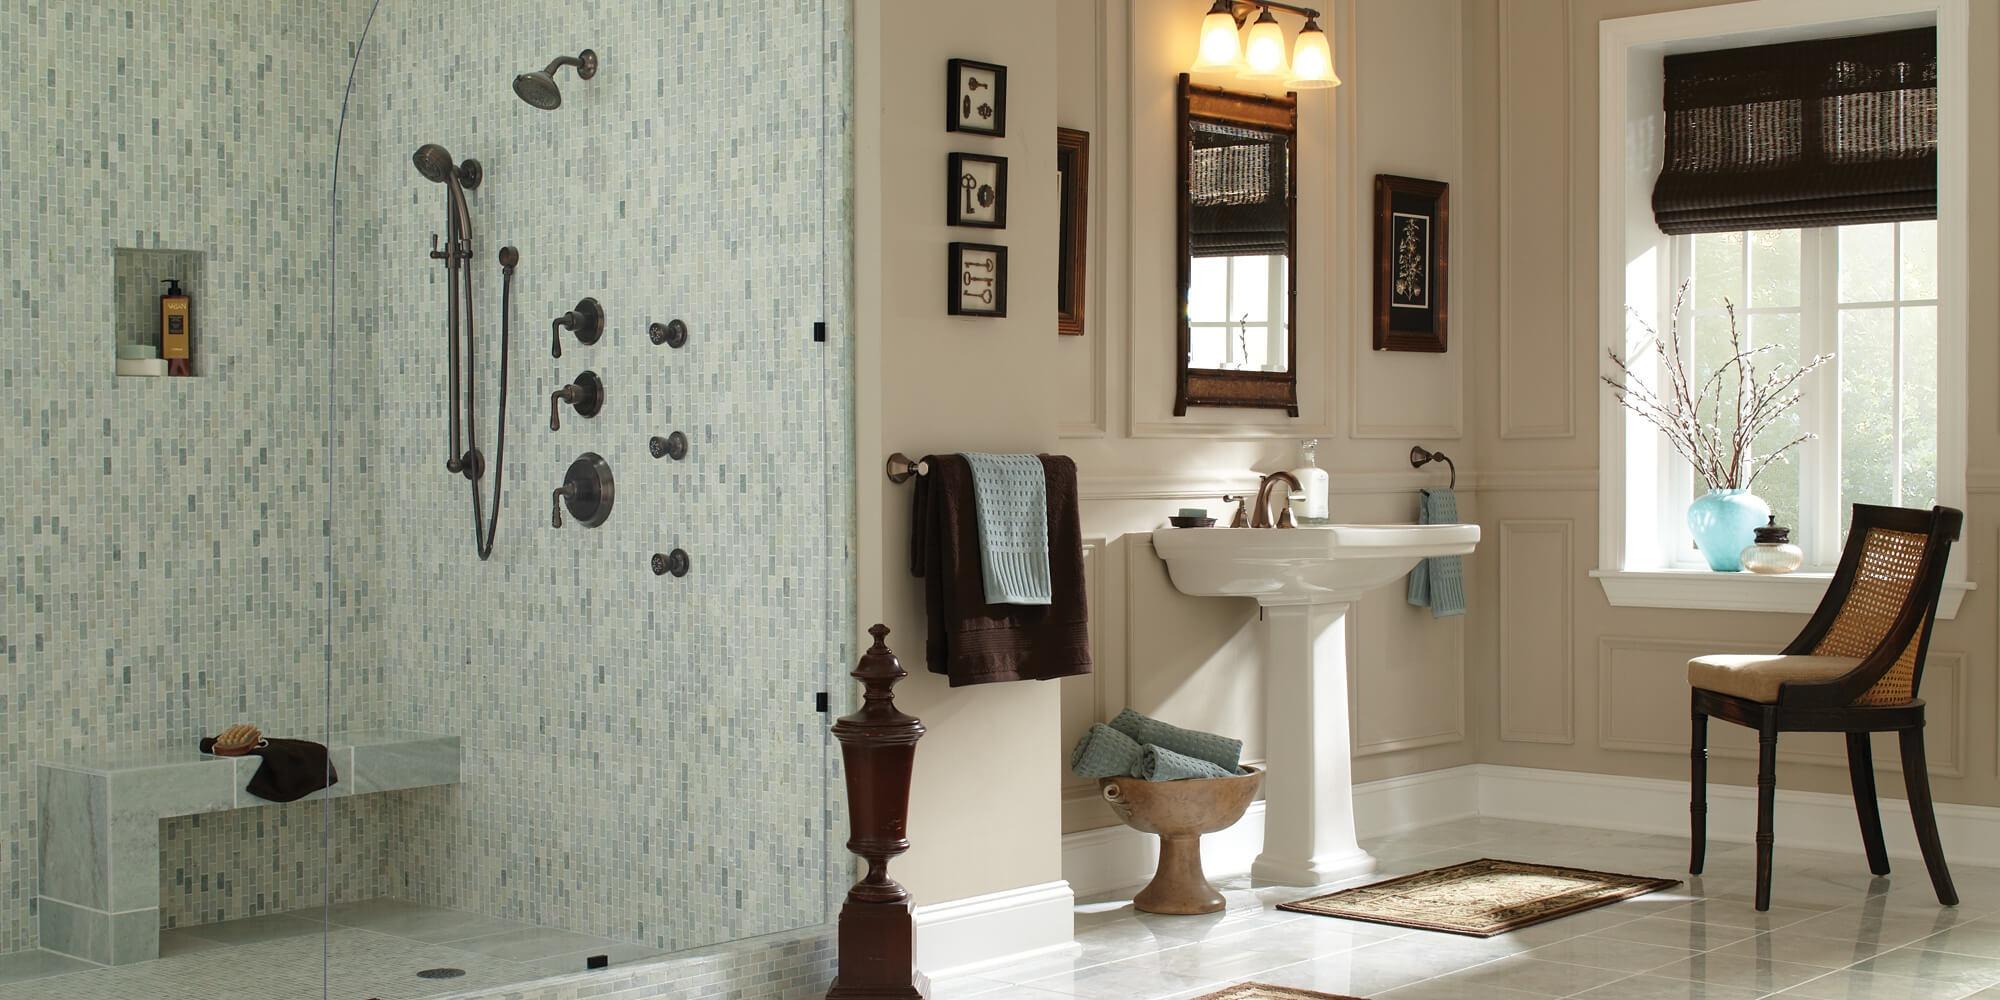 Bathroom Terminology - Understanding the Basic Bathroom Concepts